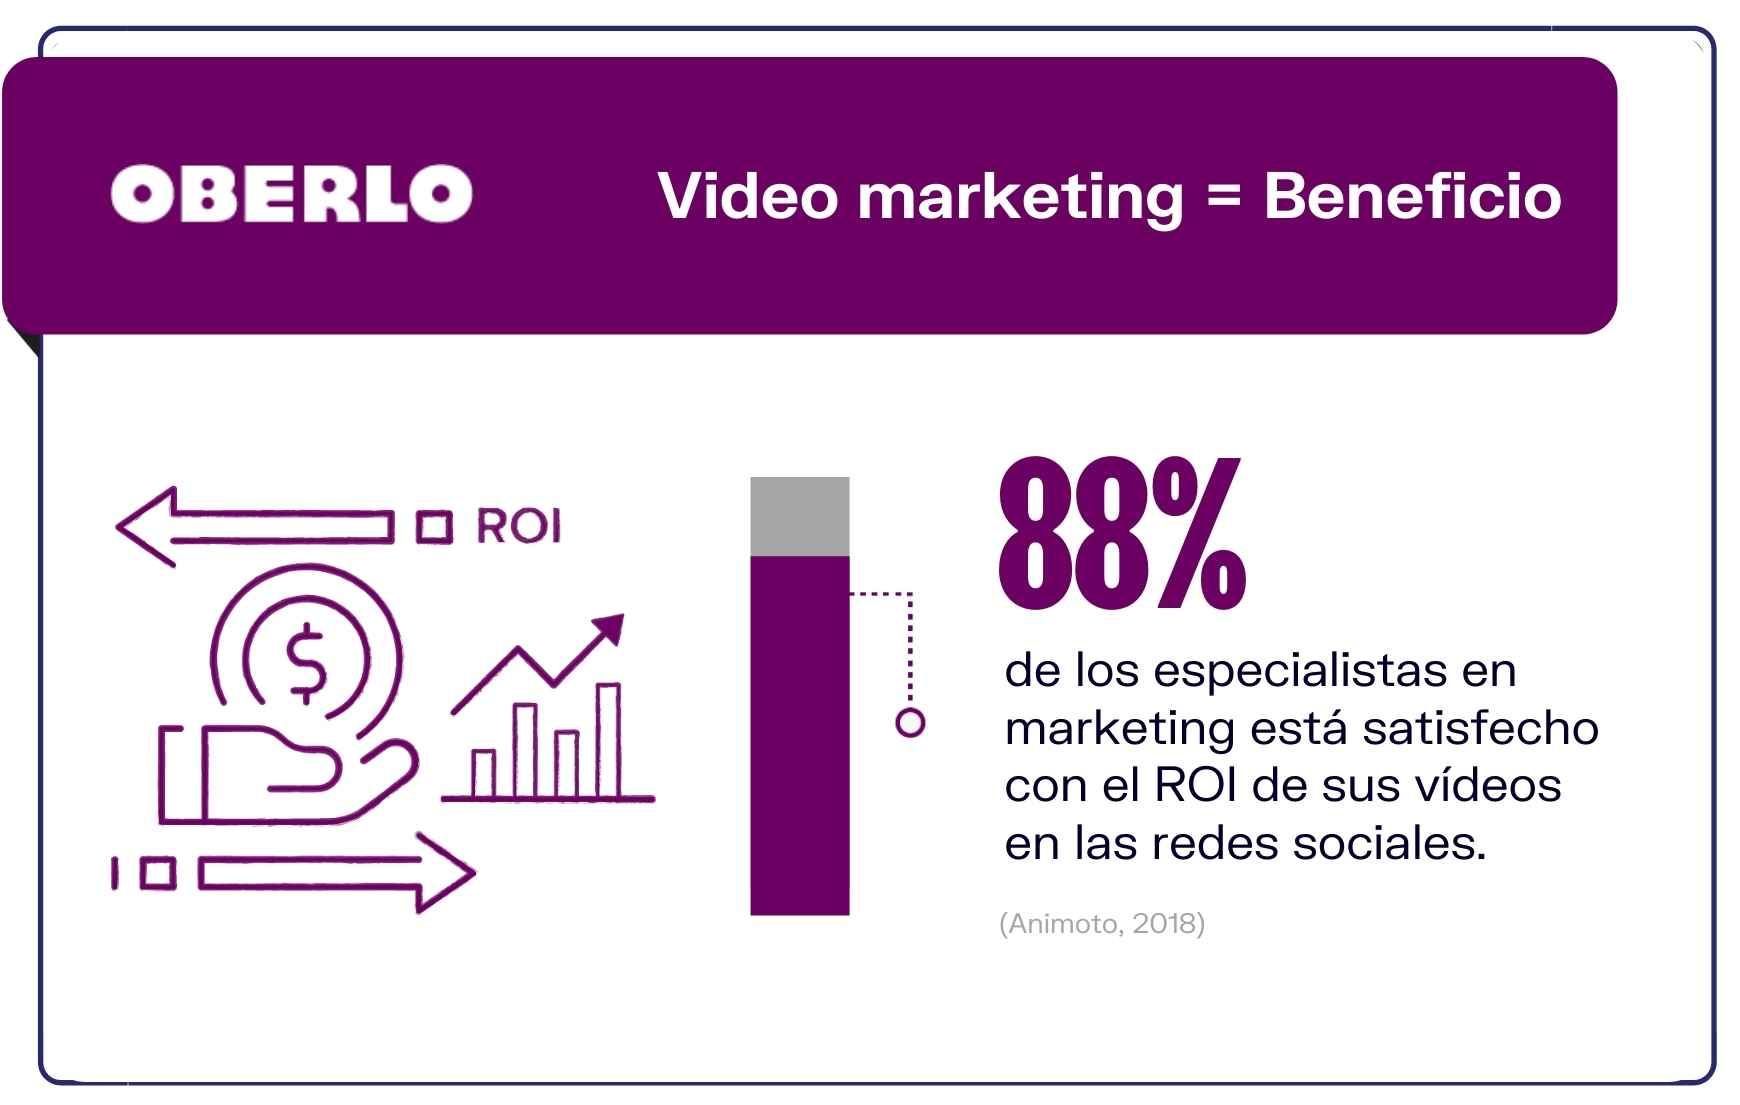 Usuarios de video marketing